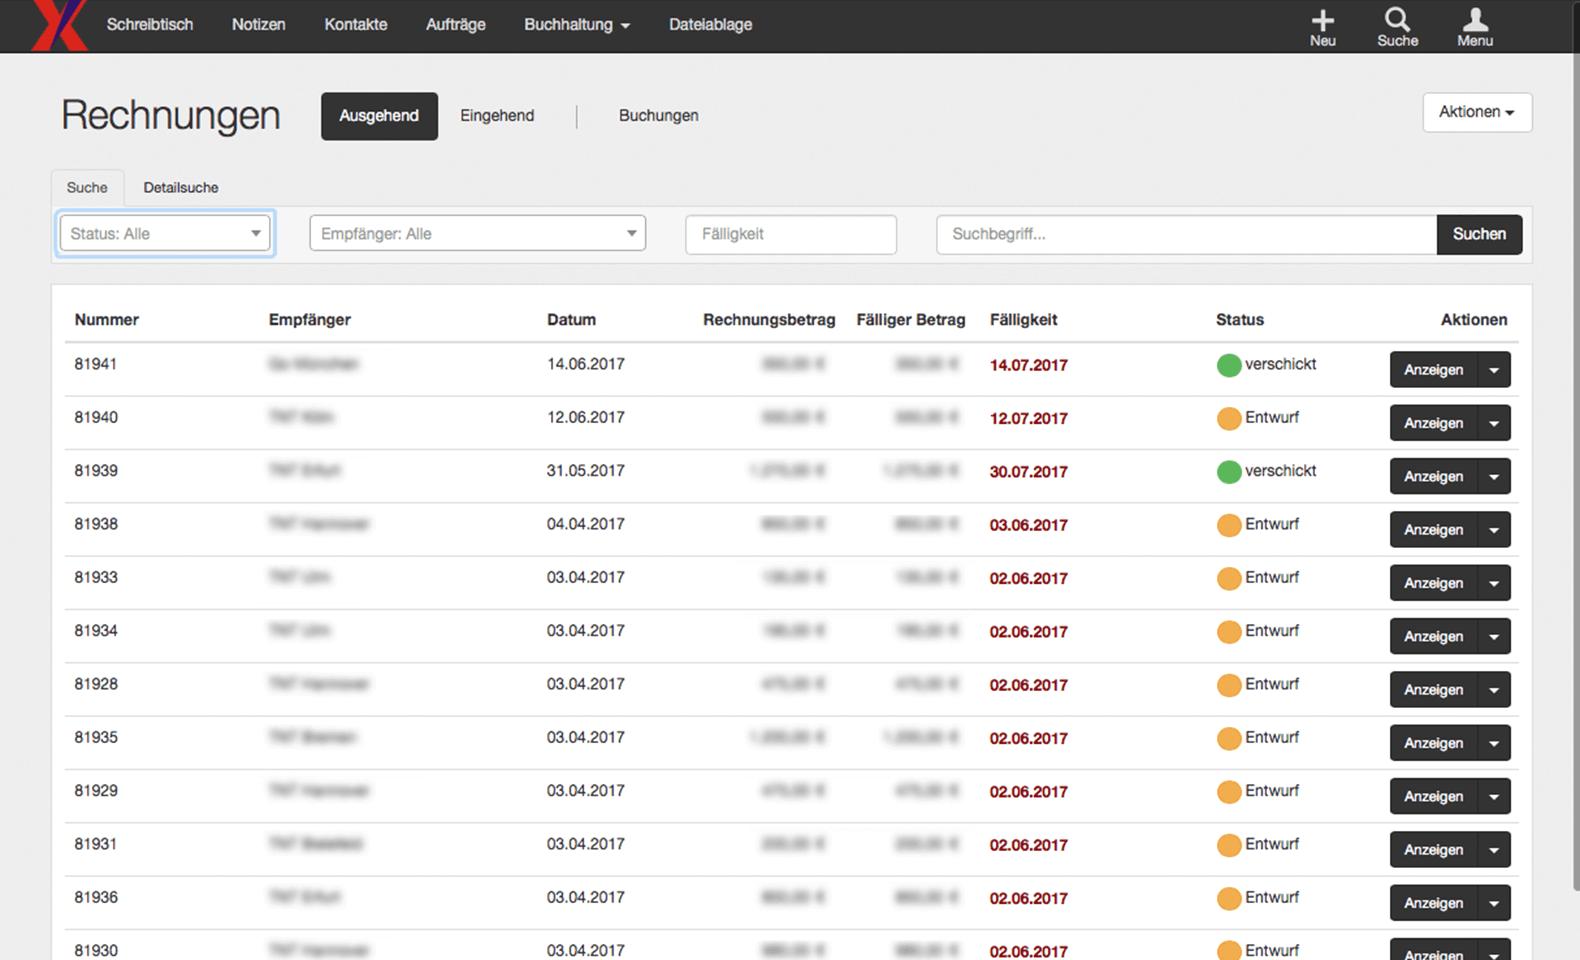 Xpress24 - Auftragsverwaltung - Liste aller Rechnungen